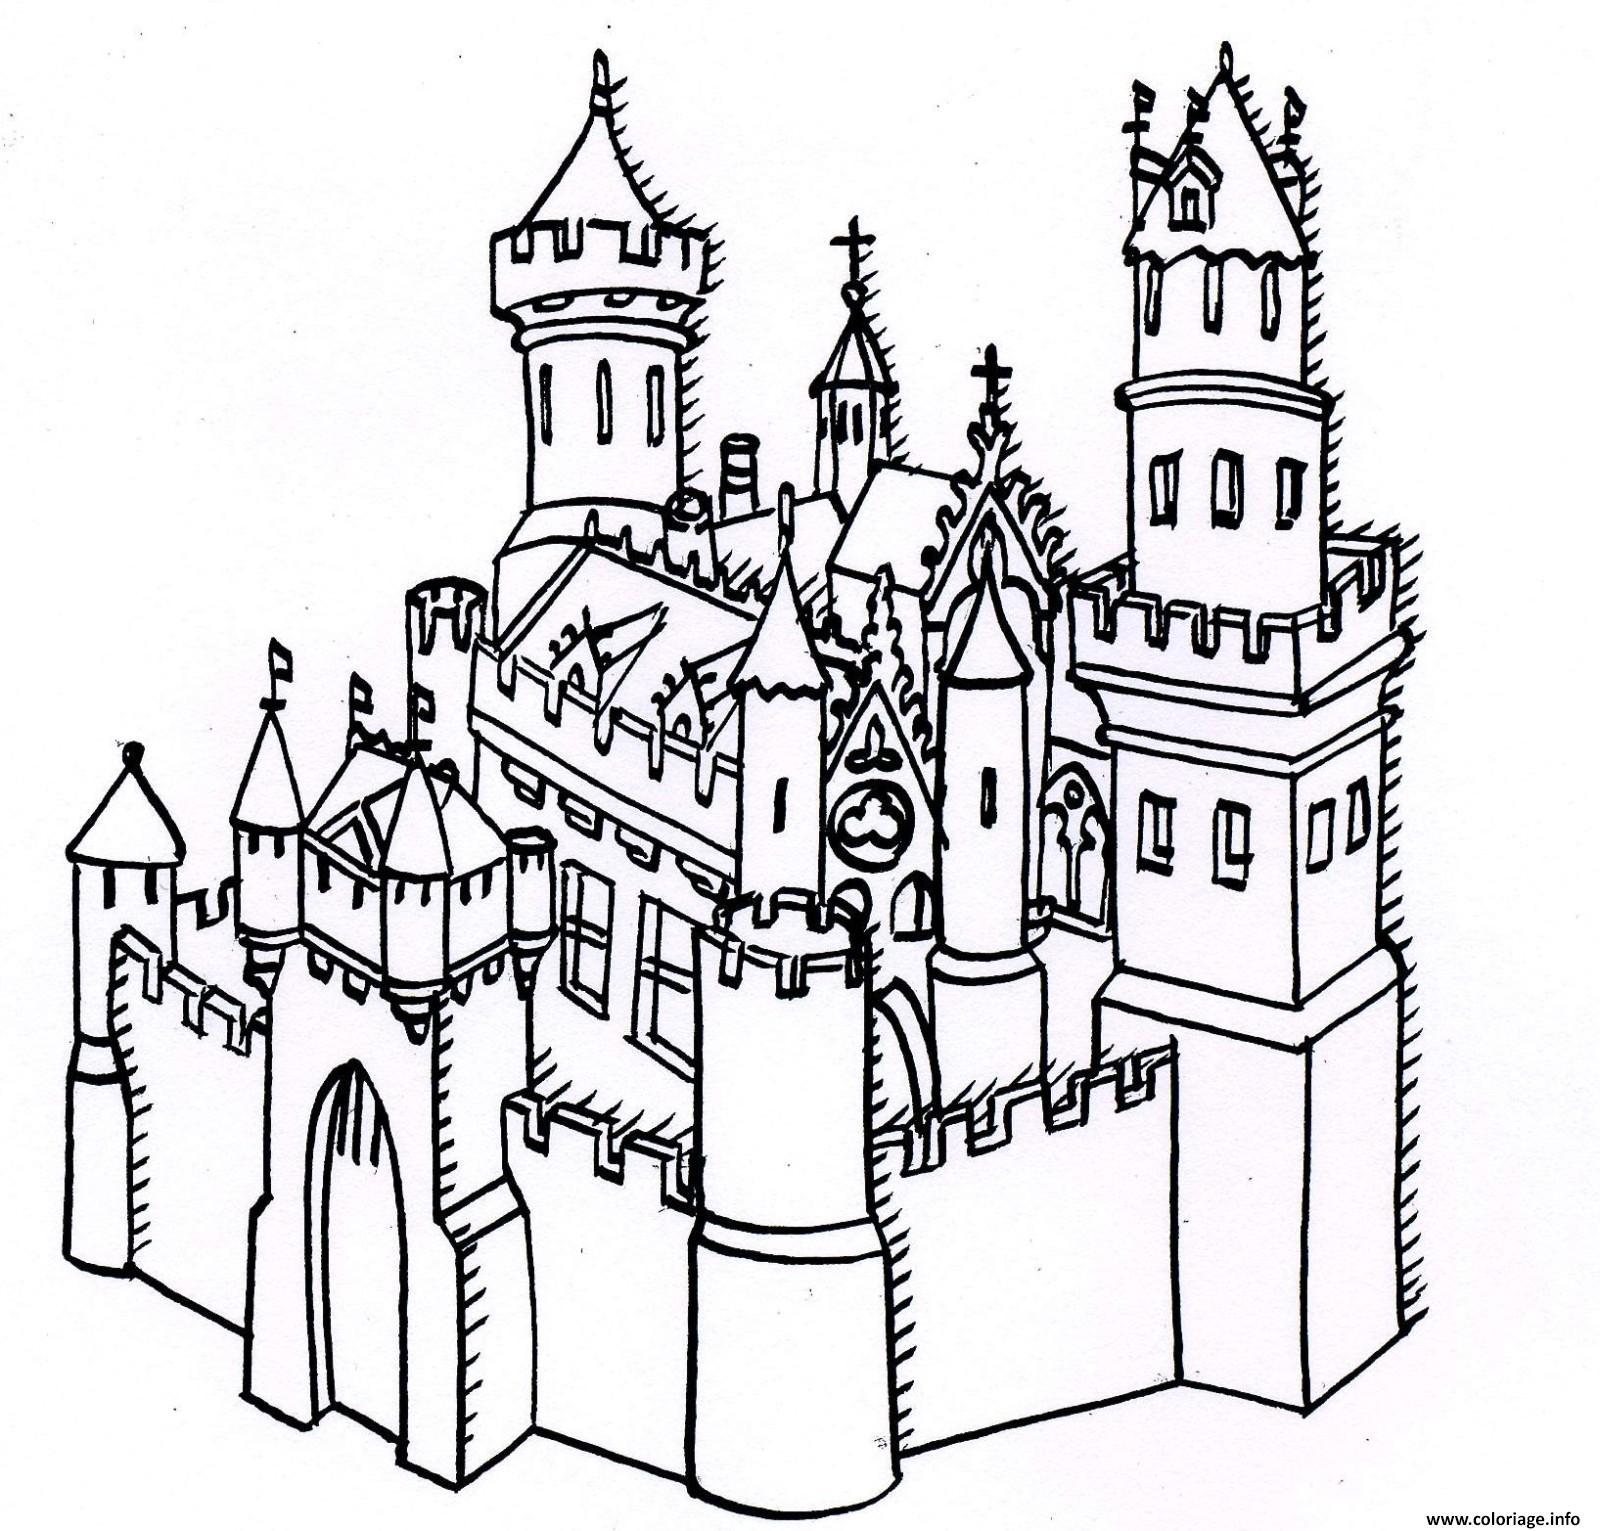 Coloriage Image Chateau.Coloriage Chateau Forteresse Dessin